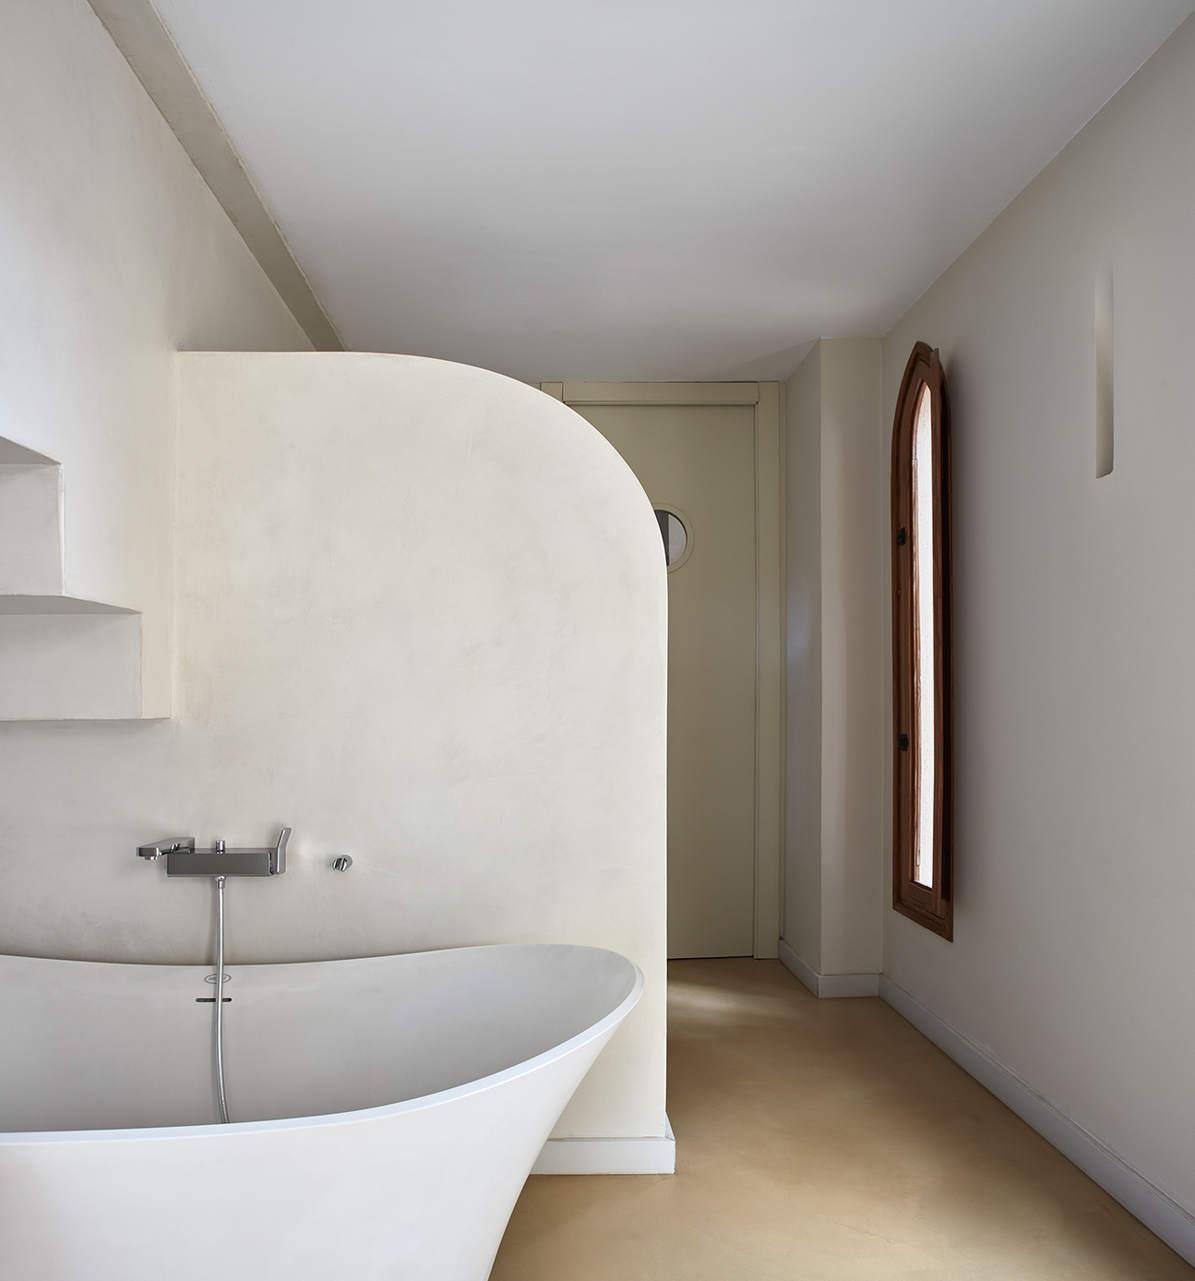 Microcement bathroom walls and floor Casa Isabel